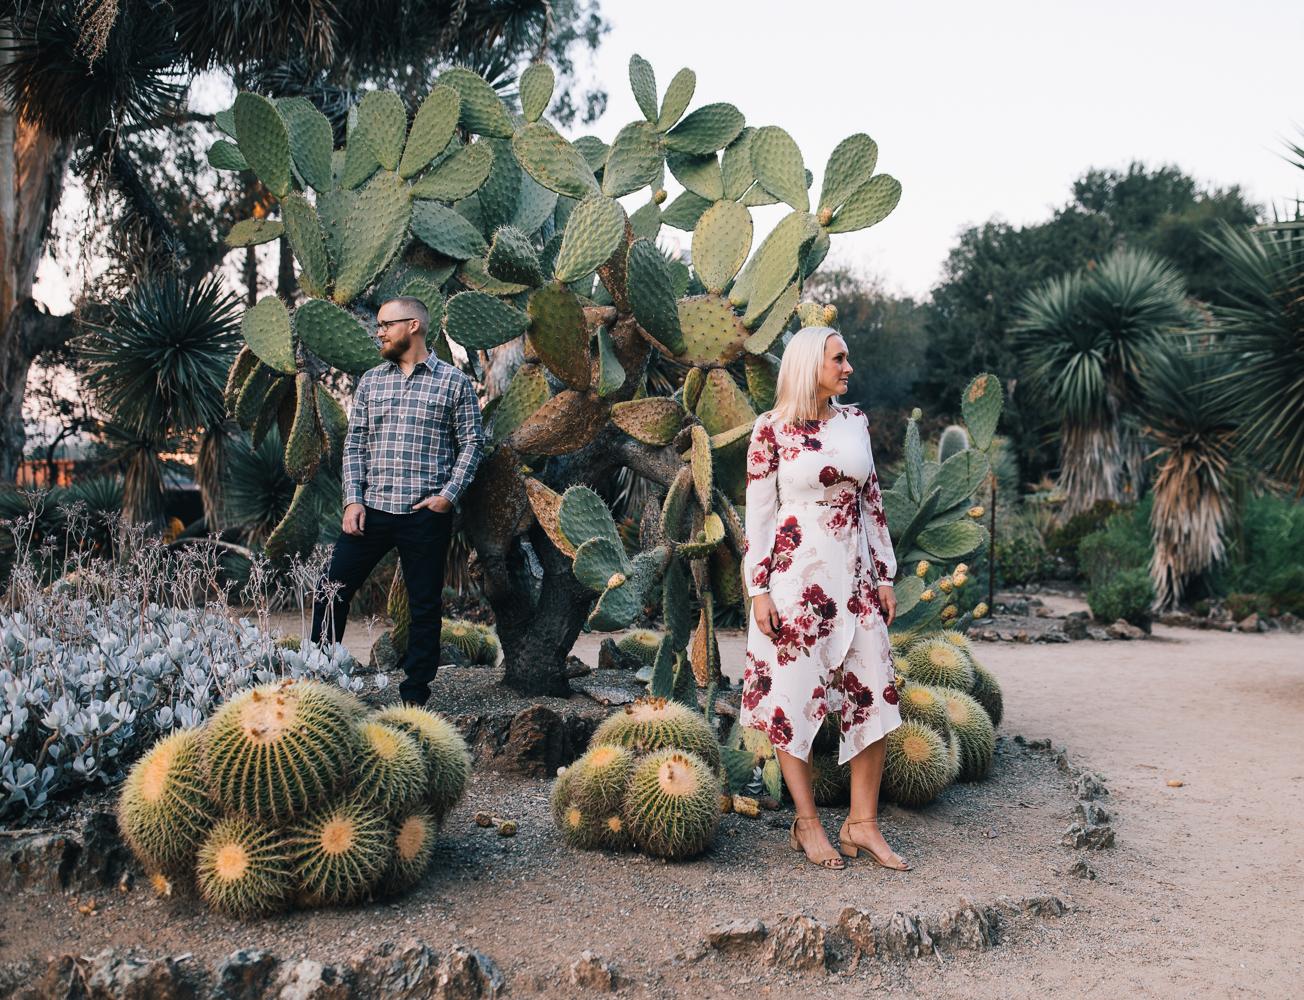 2018_11_ 11Erin + Jeff Arizona Garden Engagement Session Edited For Web 0021.jpg